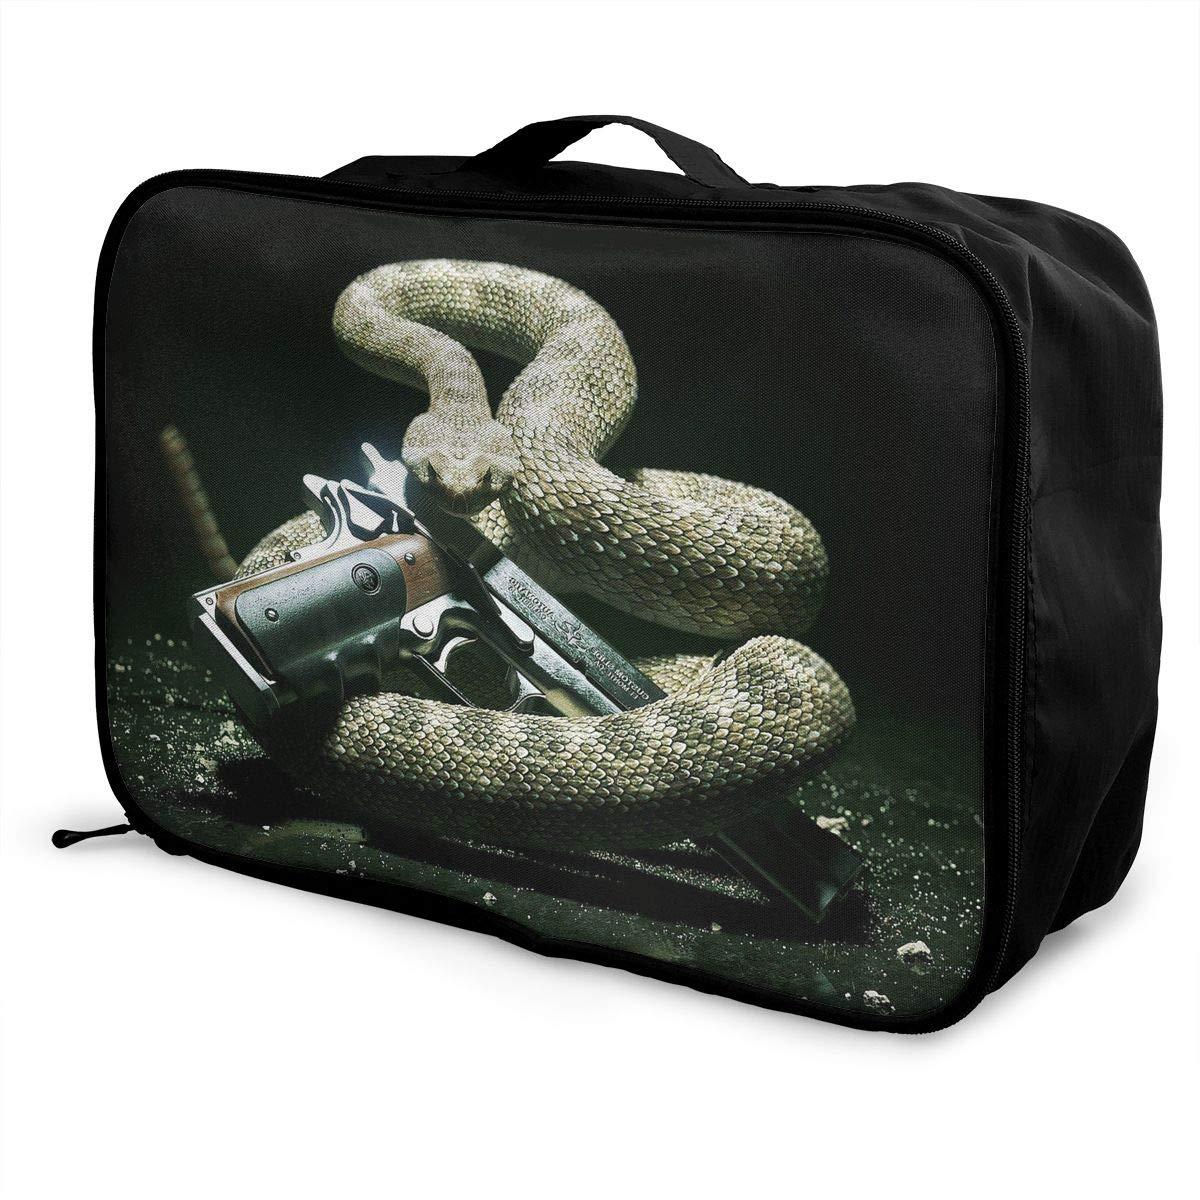 Travel Luggage Duffle Bag Lightweight Portable Handbag Snake Print Large Capacity Waterproof Foldable Storage Tote